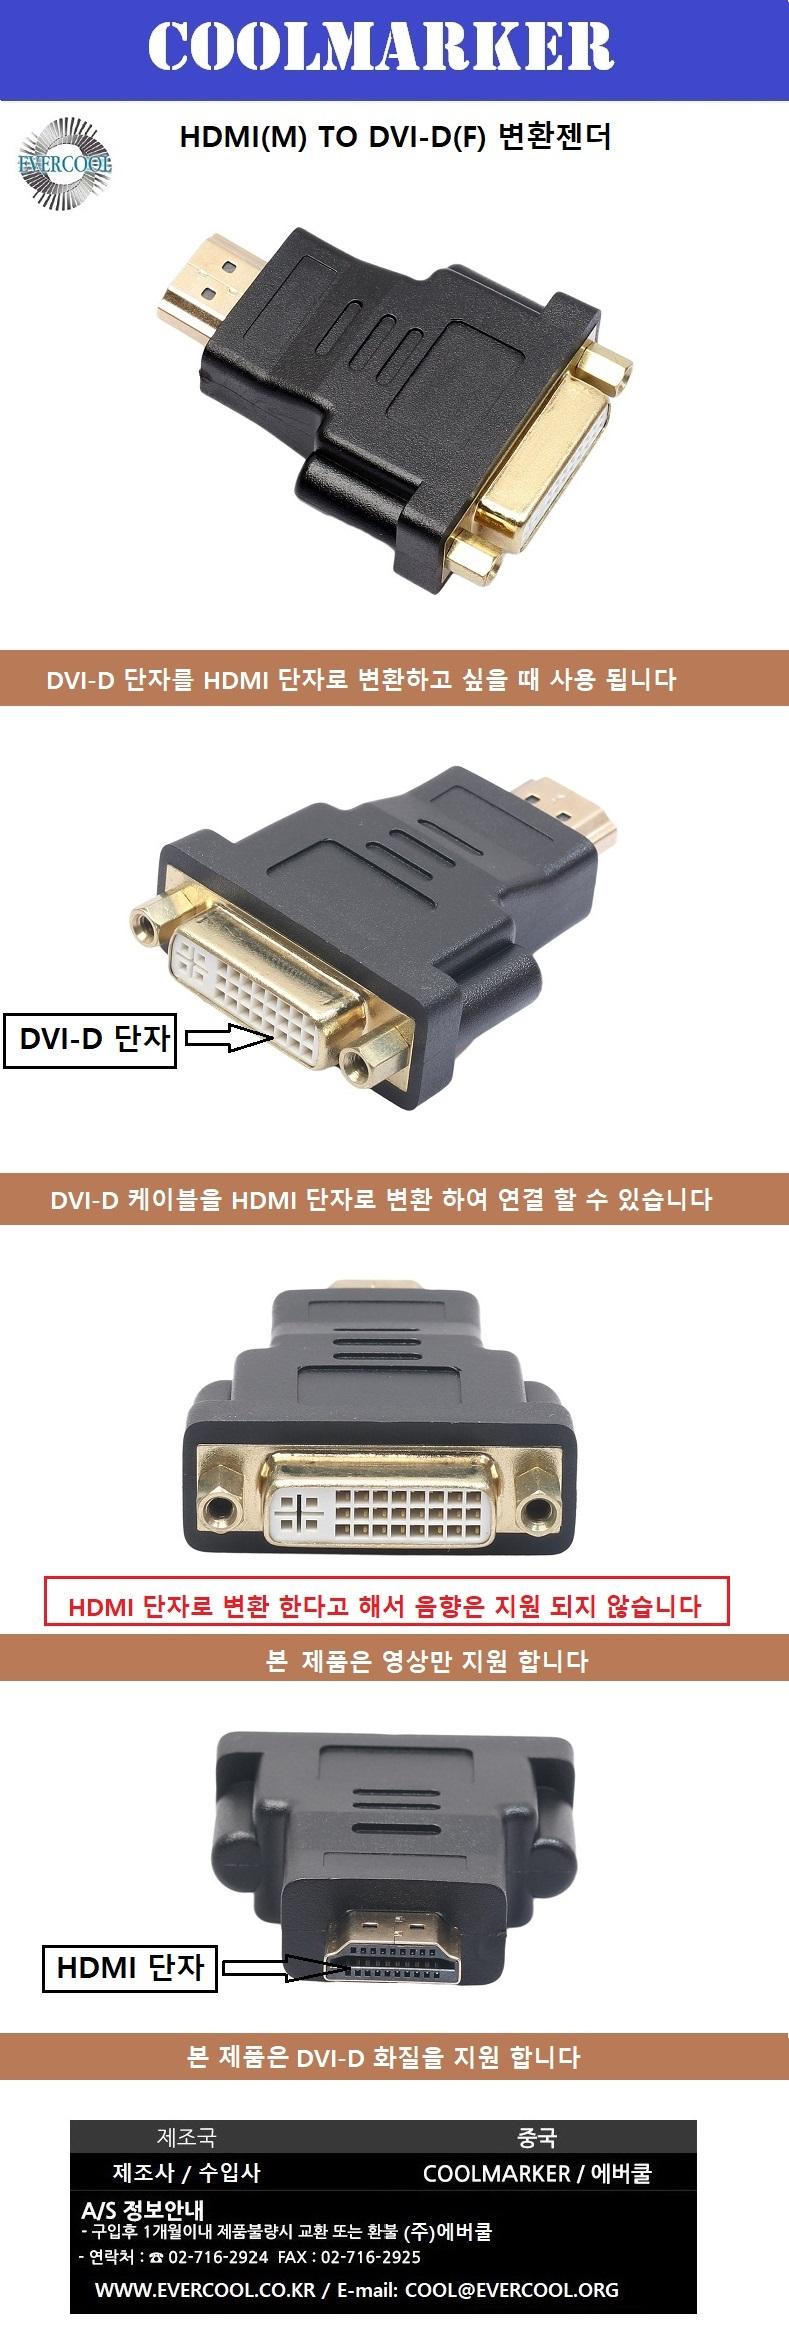 EVERCOOL COOLMARKER DVI to HDMI 변환젠더